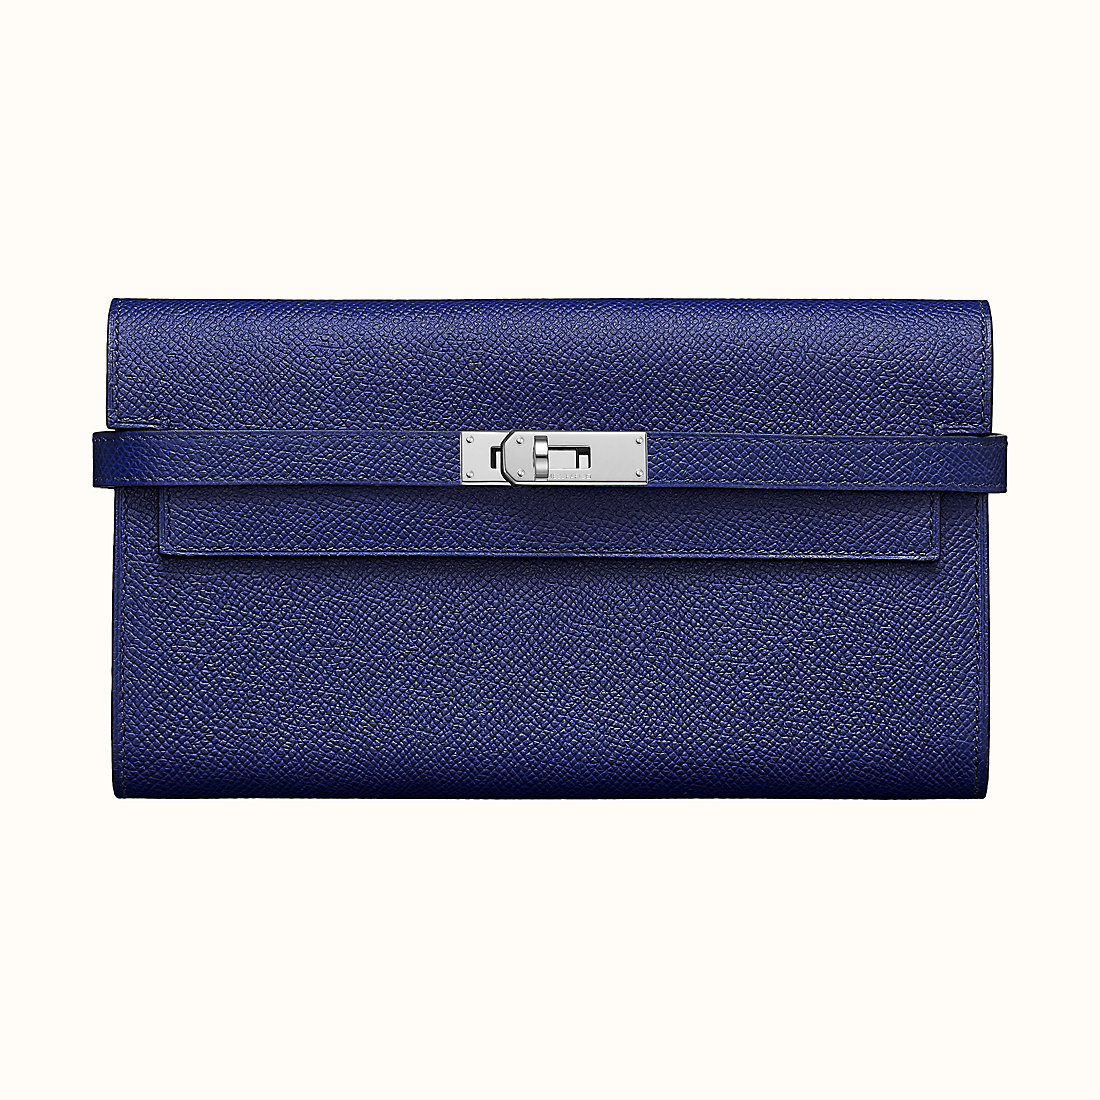 Hermes Kelly classic verso wallet Bleu Encre 墨水藍/Bleu Zellige 琉璃藍